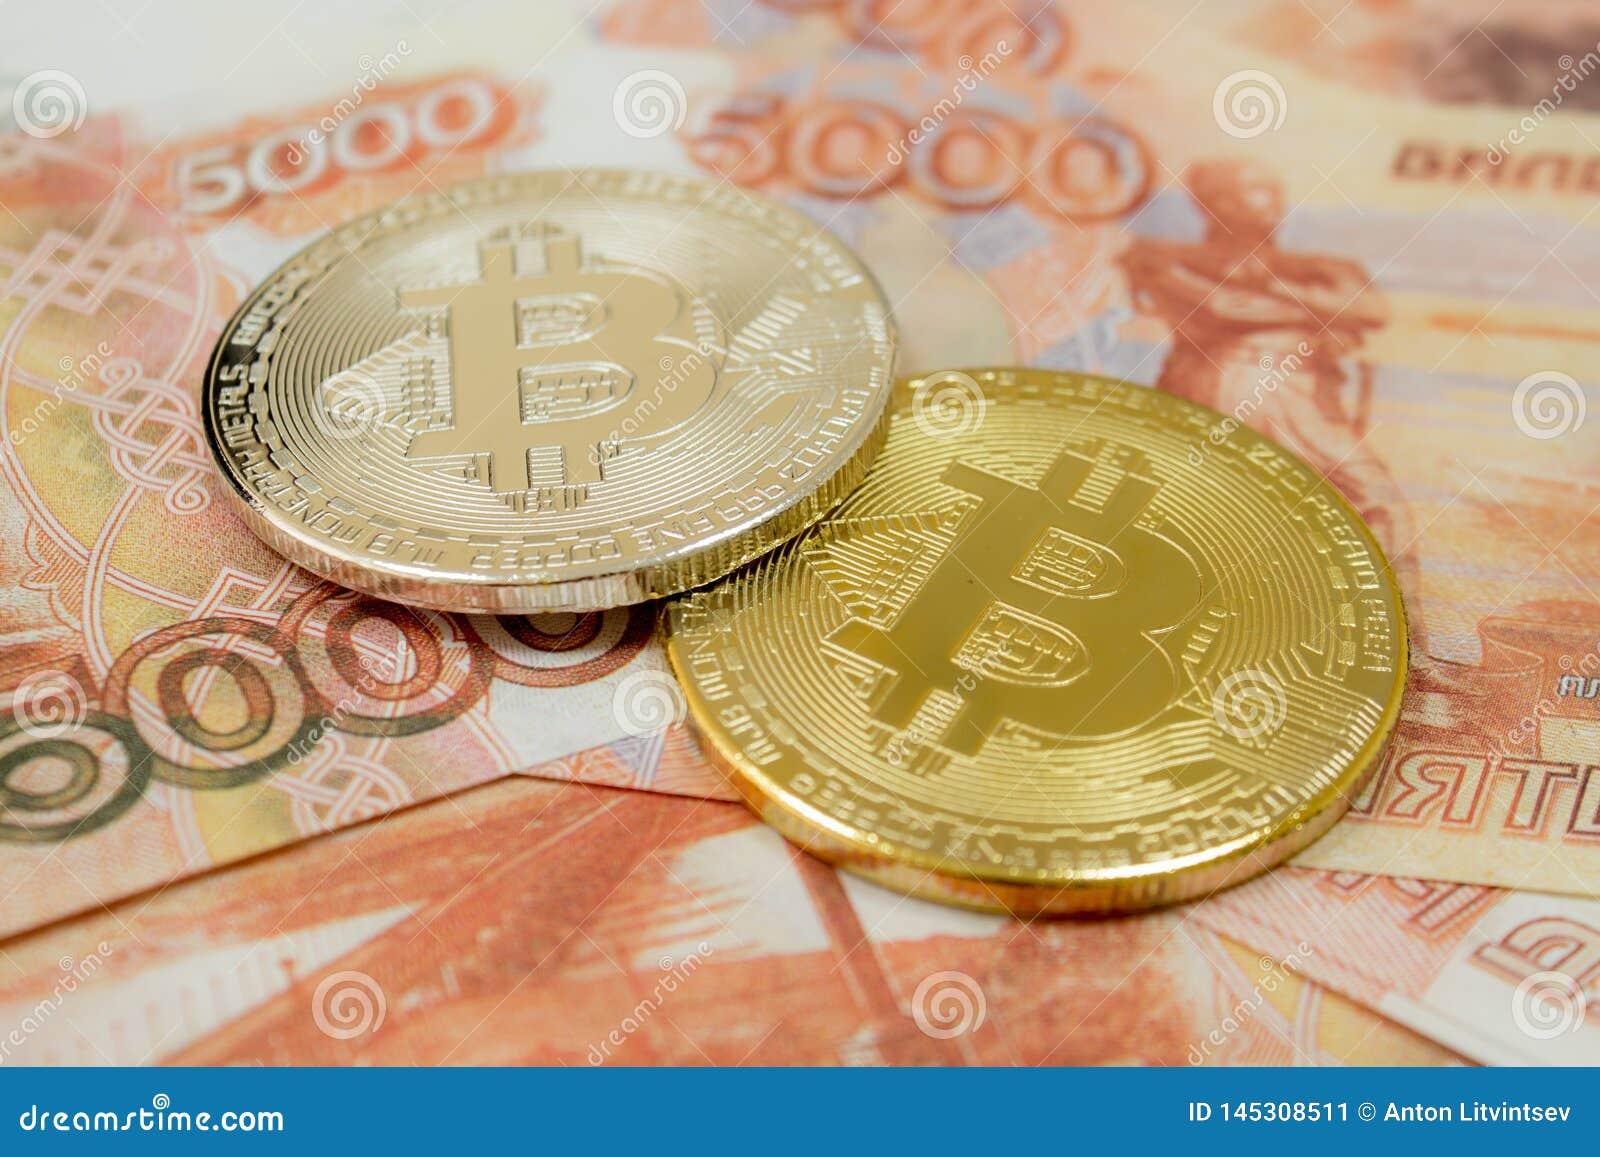 btc ruble coin